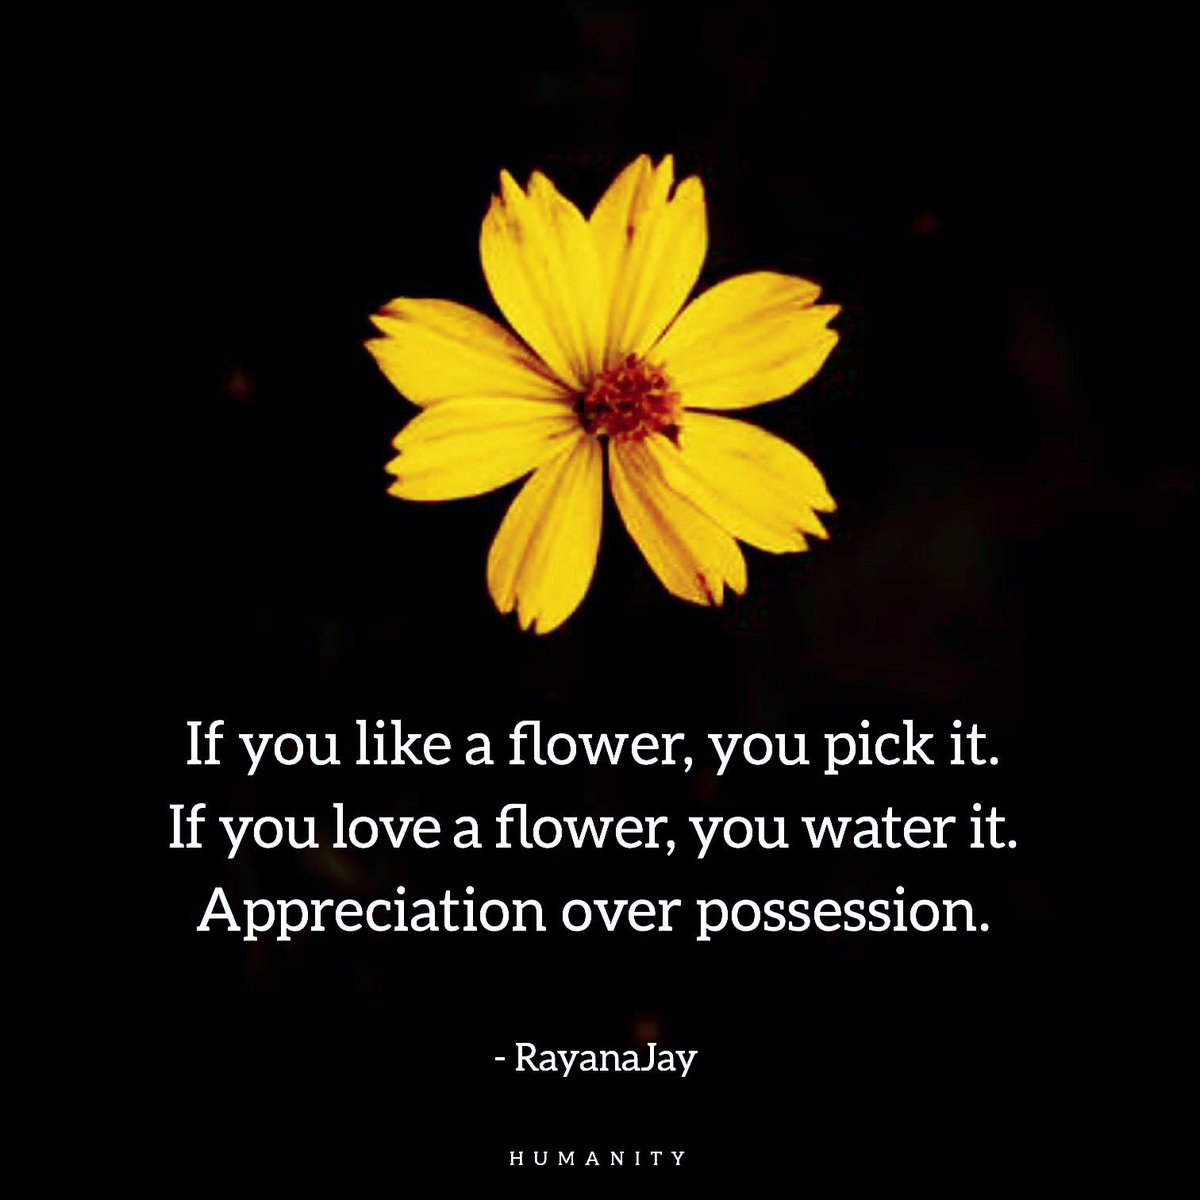 Appreciation  #appreciation #gratitudequotes #joy #sparkjoy #joyful #joyfulheart #gratitude #gratefulheart #gratefulmindset #thankful #thankfulquotes #life #living #thankfulforyou #gratefulness #gratefuleveryday #gratitudeattitude #attitude #trotter <br>http://pic.twitter.com/WCwir0zglh